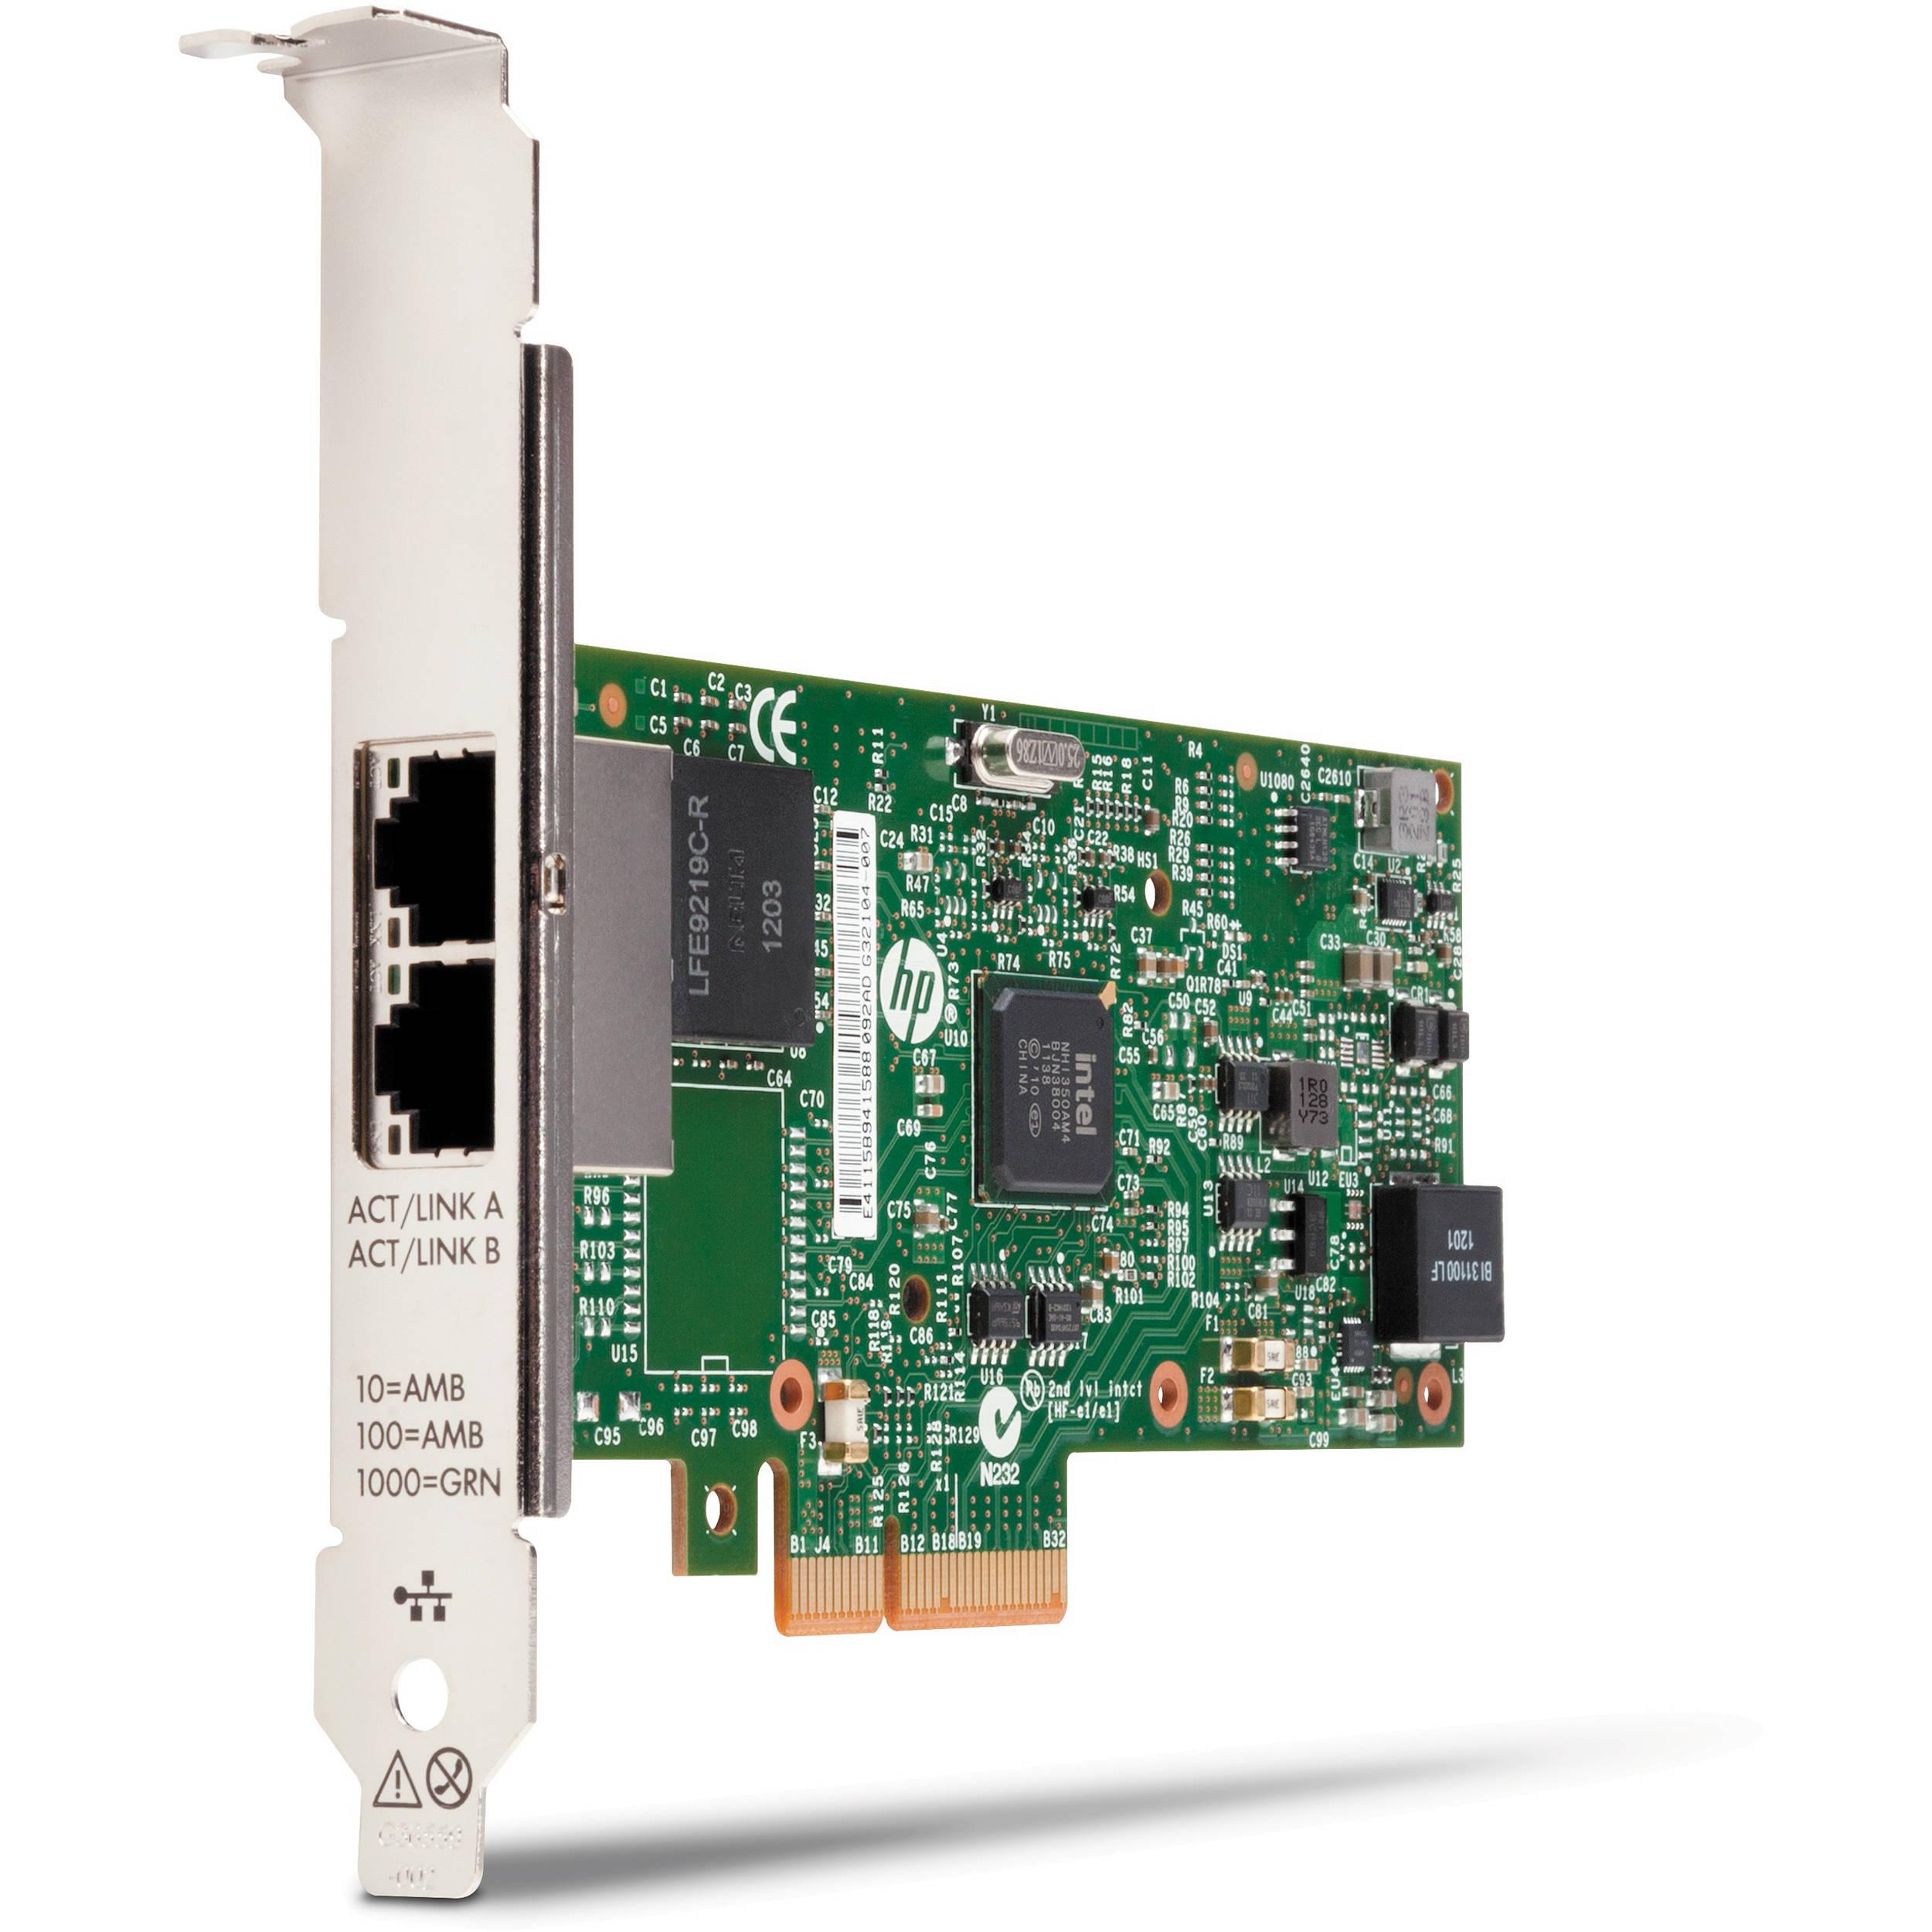 Hp 361t Pcie Dual Port Gigabit Network Interface Card C3n37aa Sony Ericsson Z800 Schematic Diagram